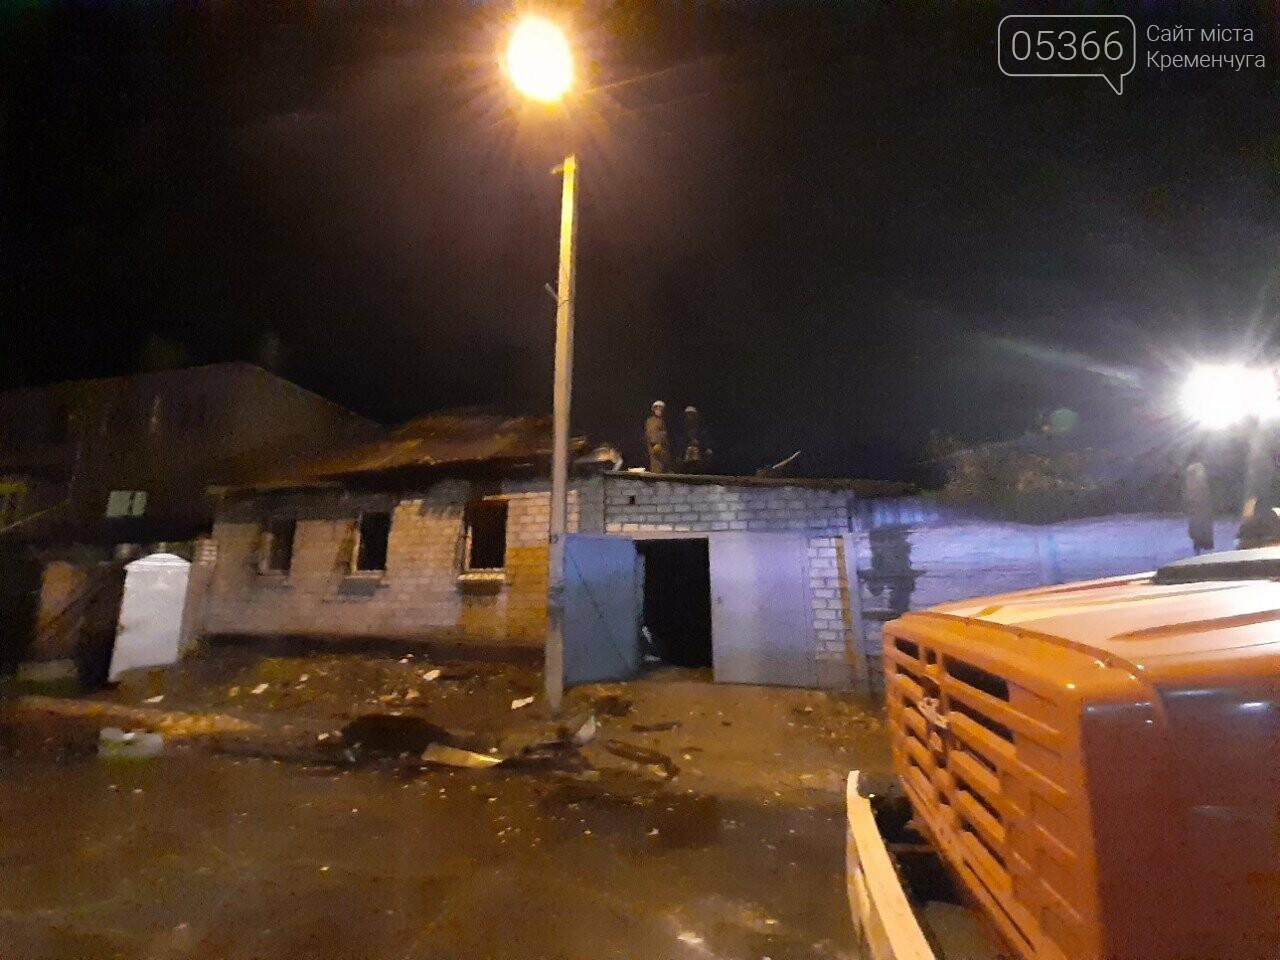 Кременчуцькі пожежники три години гасили вогонь у житловому будинку, фото-1